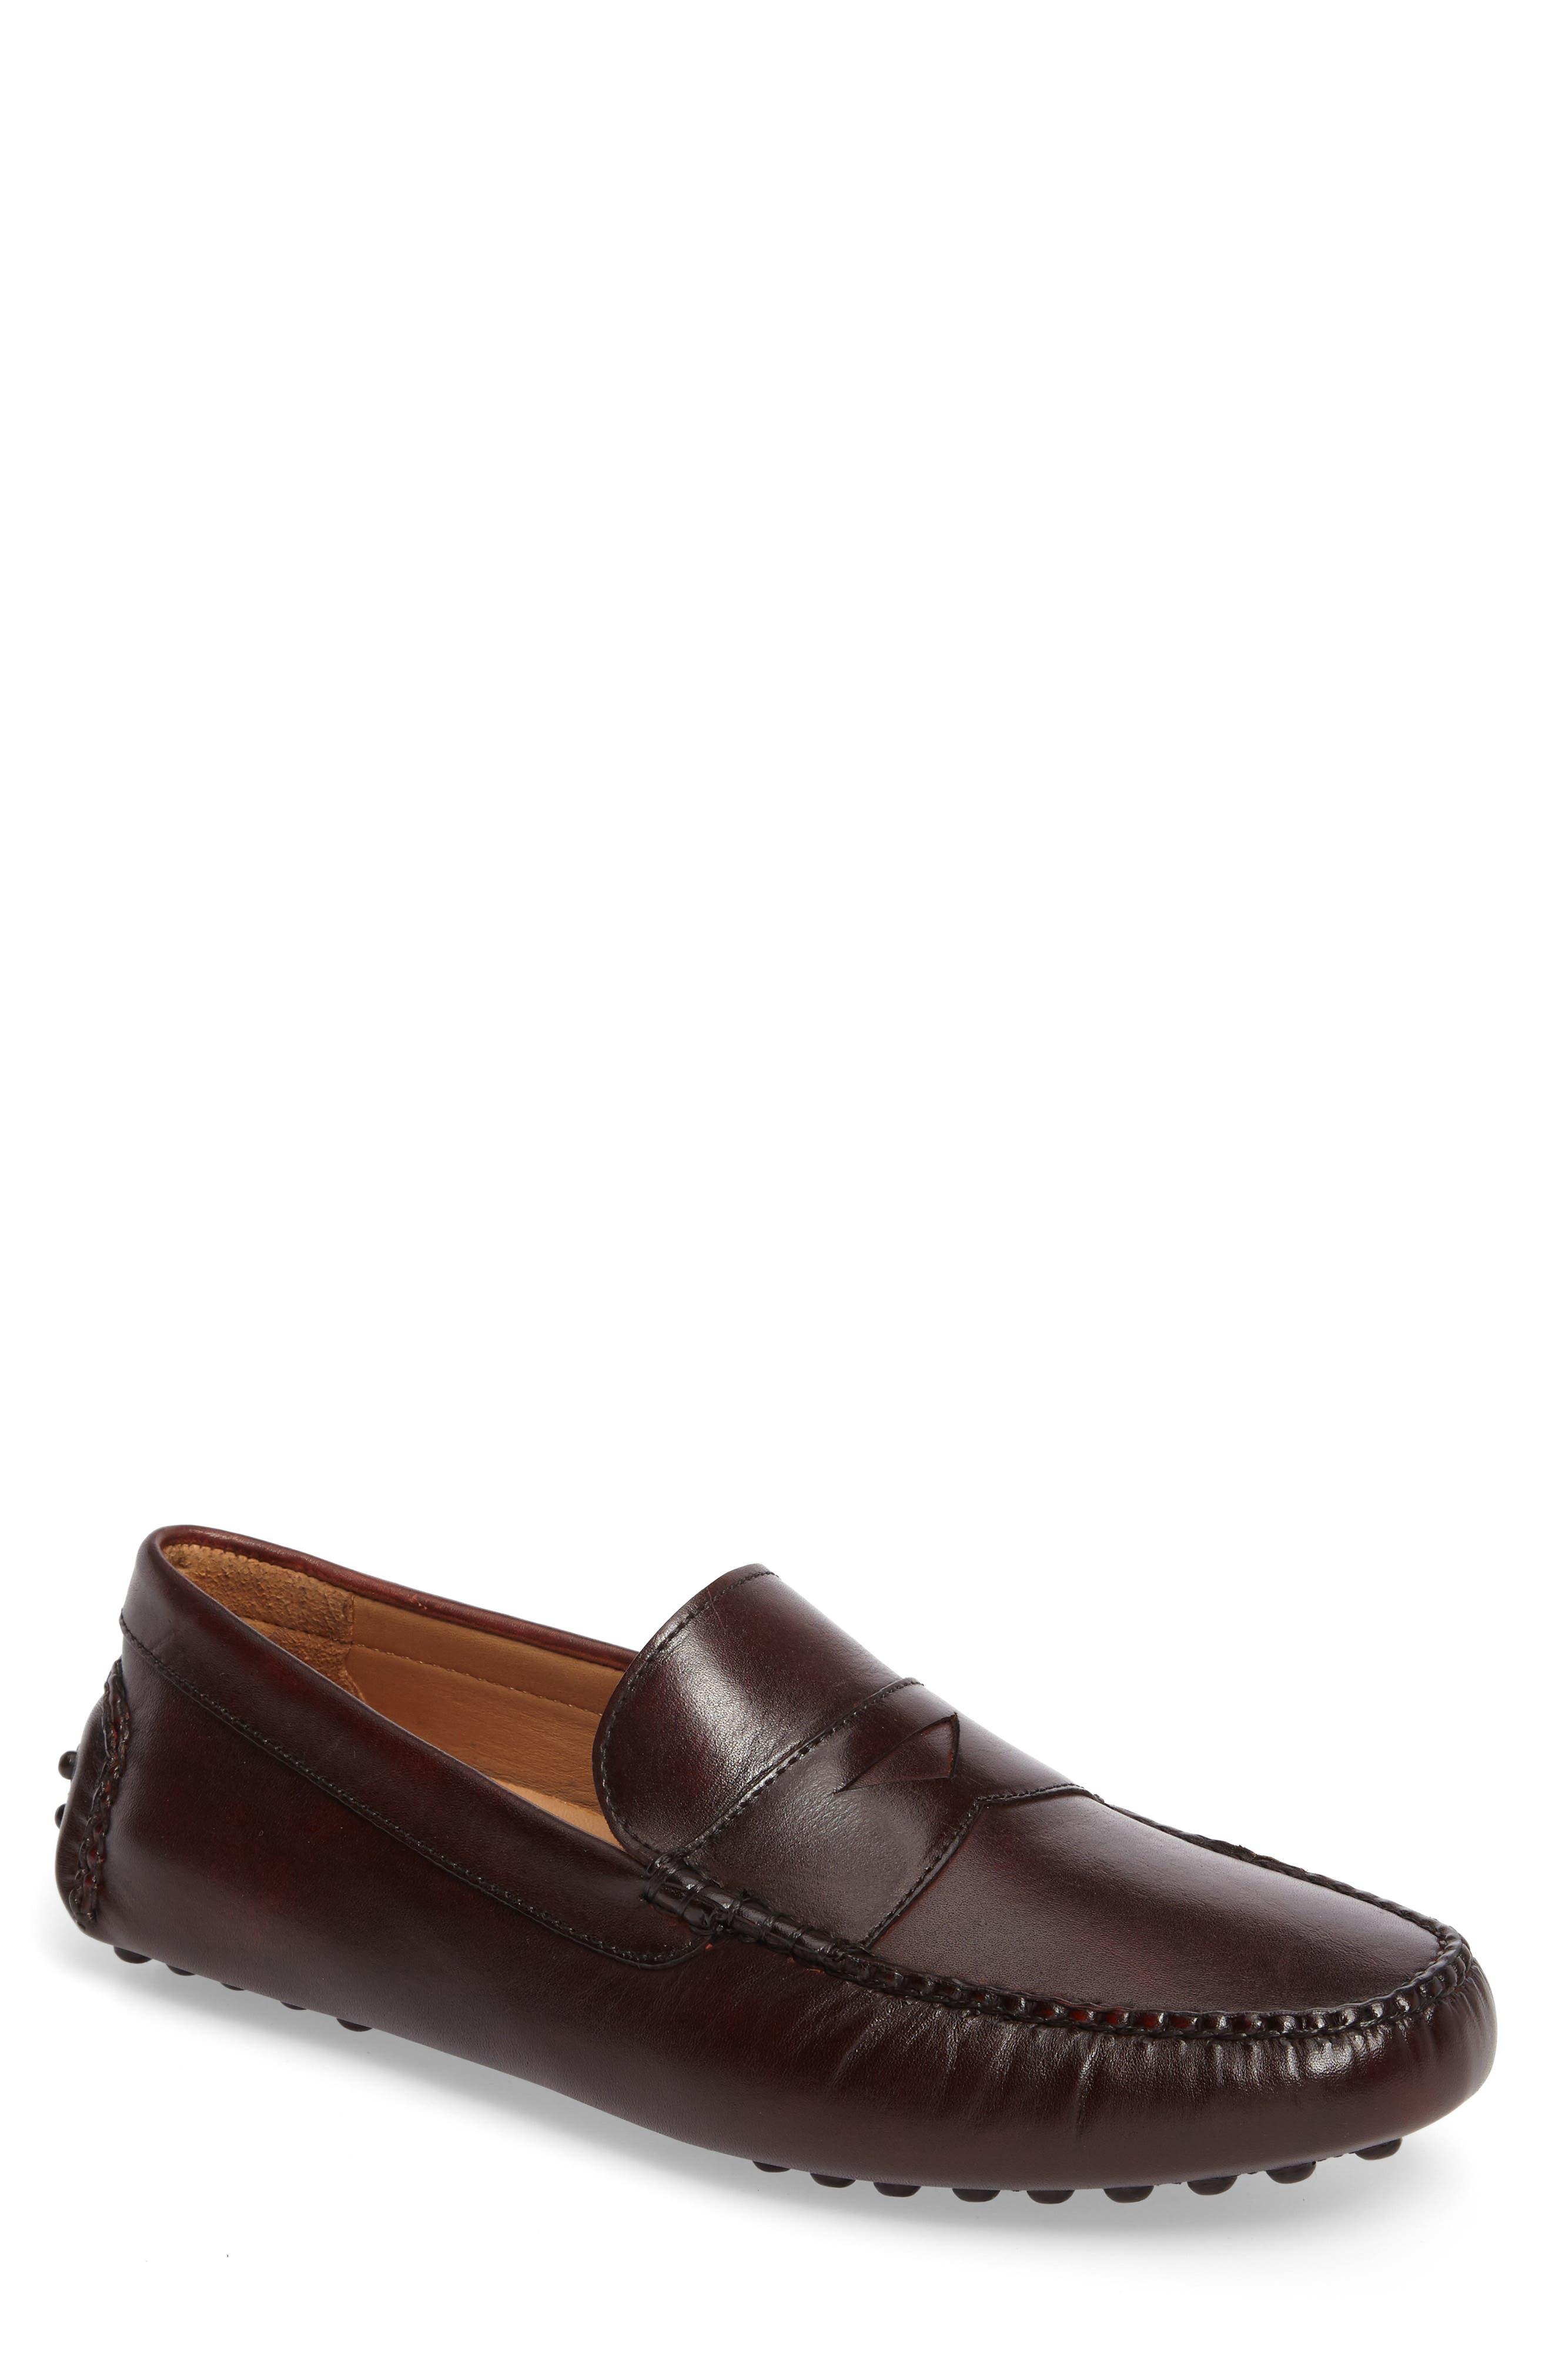 Eaton Driving Shoe,                         Main,                         color, MAHOGANY LEATHER